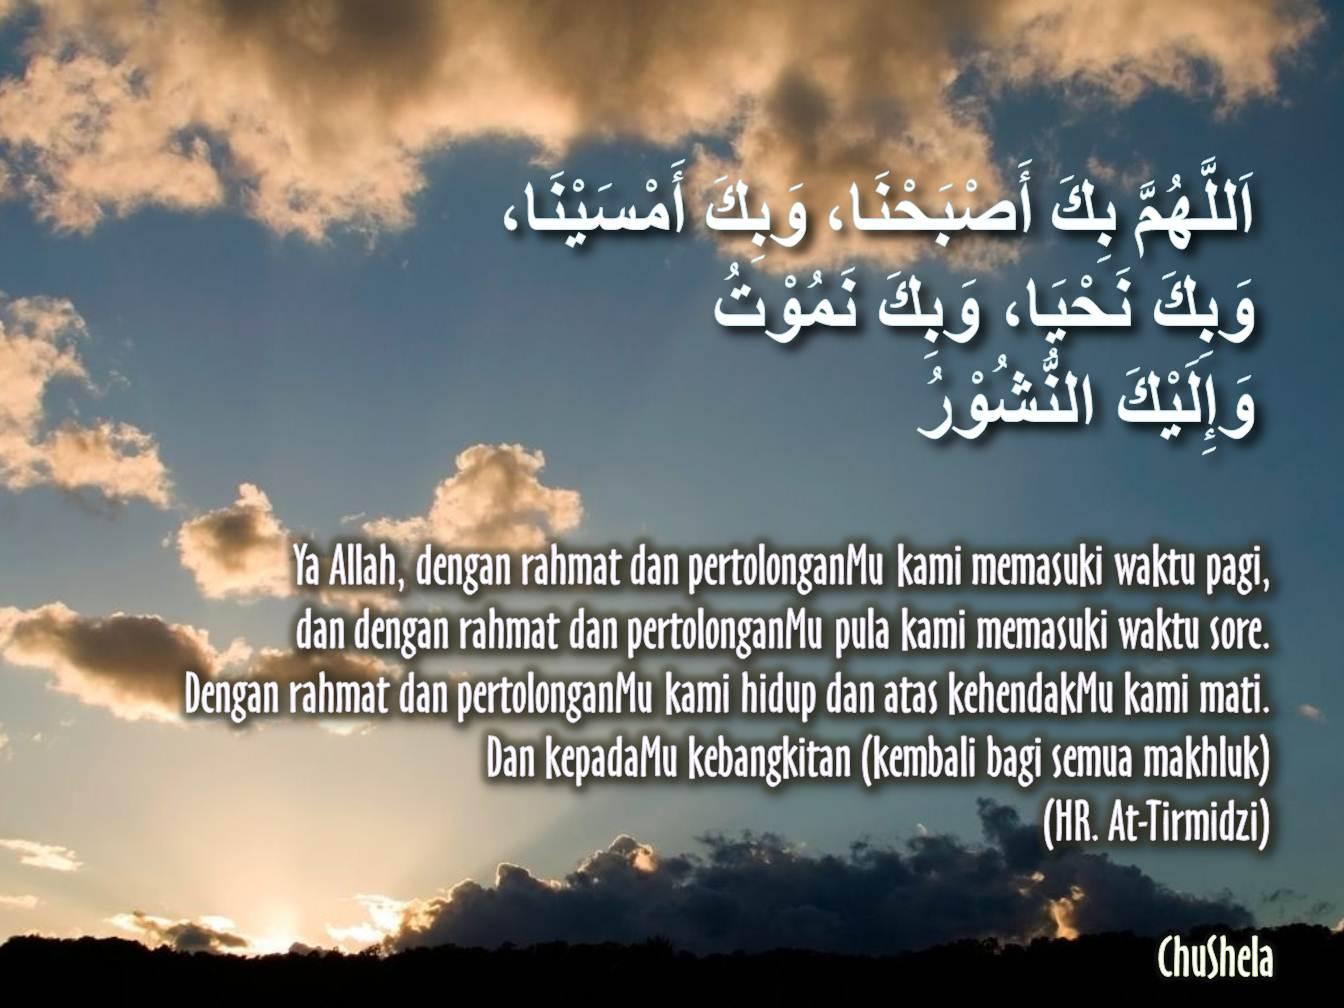 Kata Kata Islami Di Malam Hari Nusagates